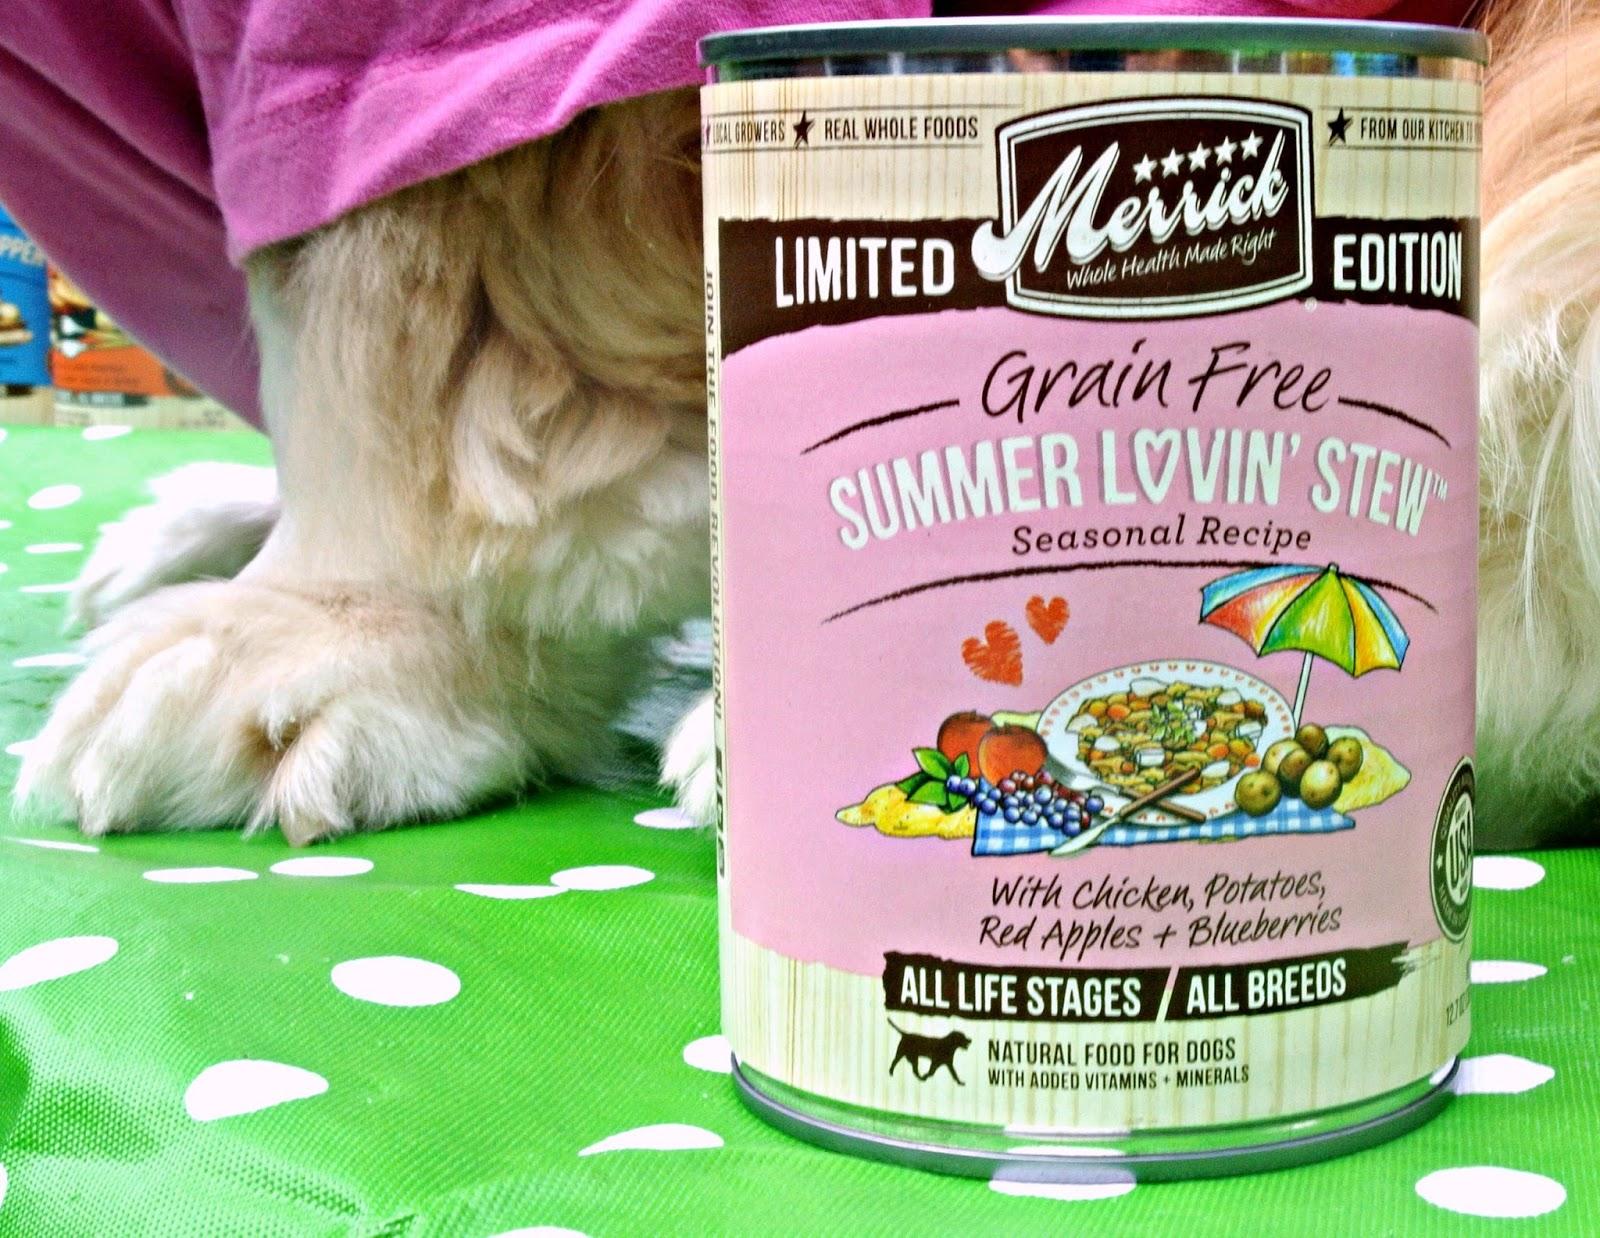 Merrick Dog Food Lawsuit